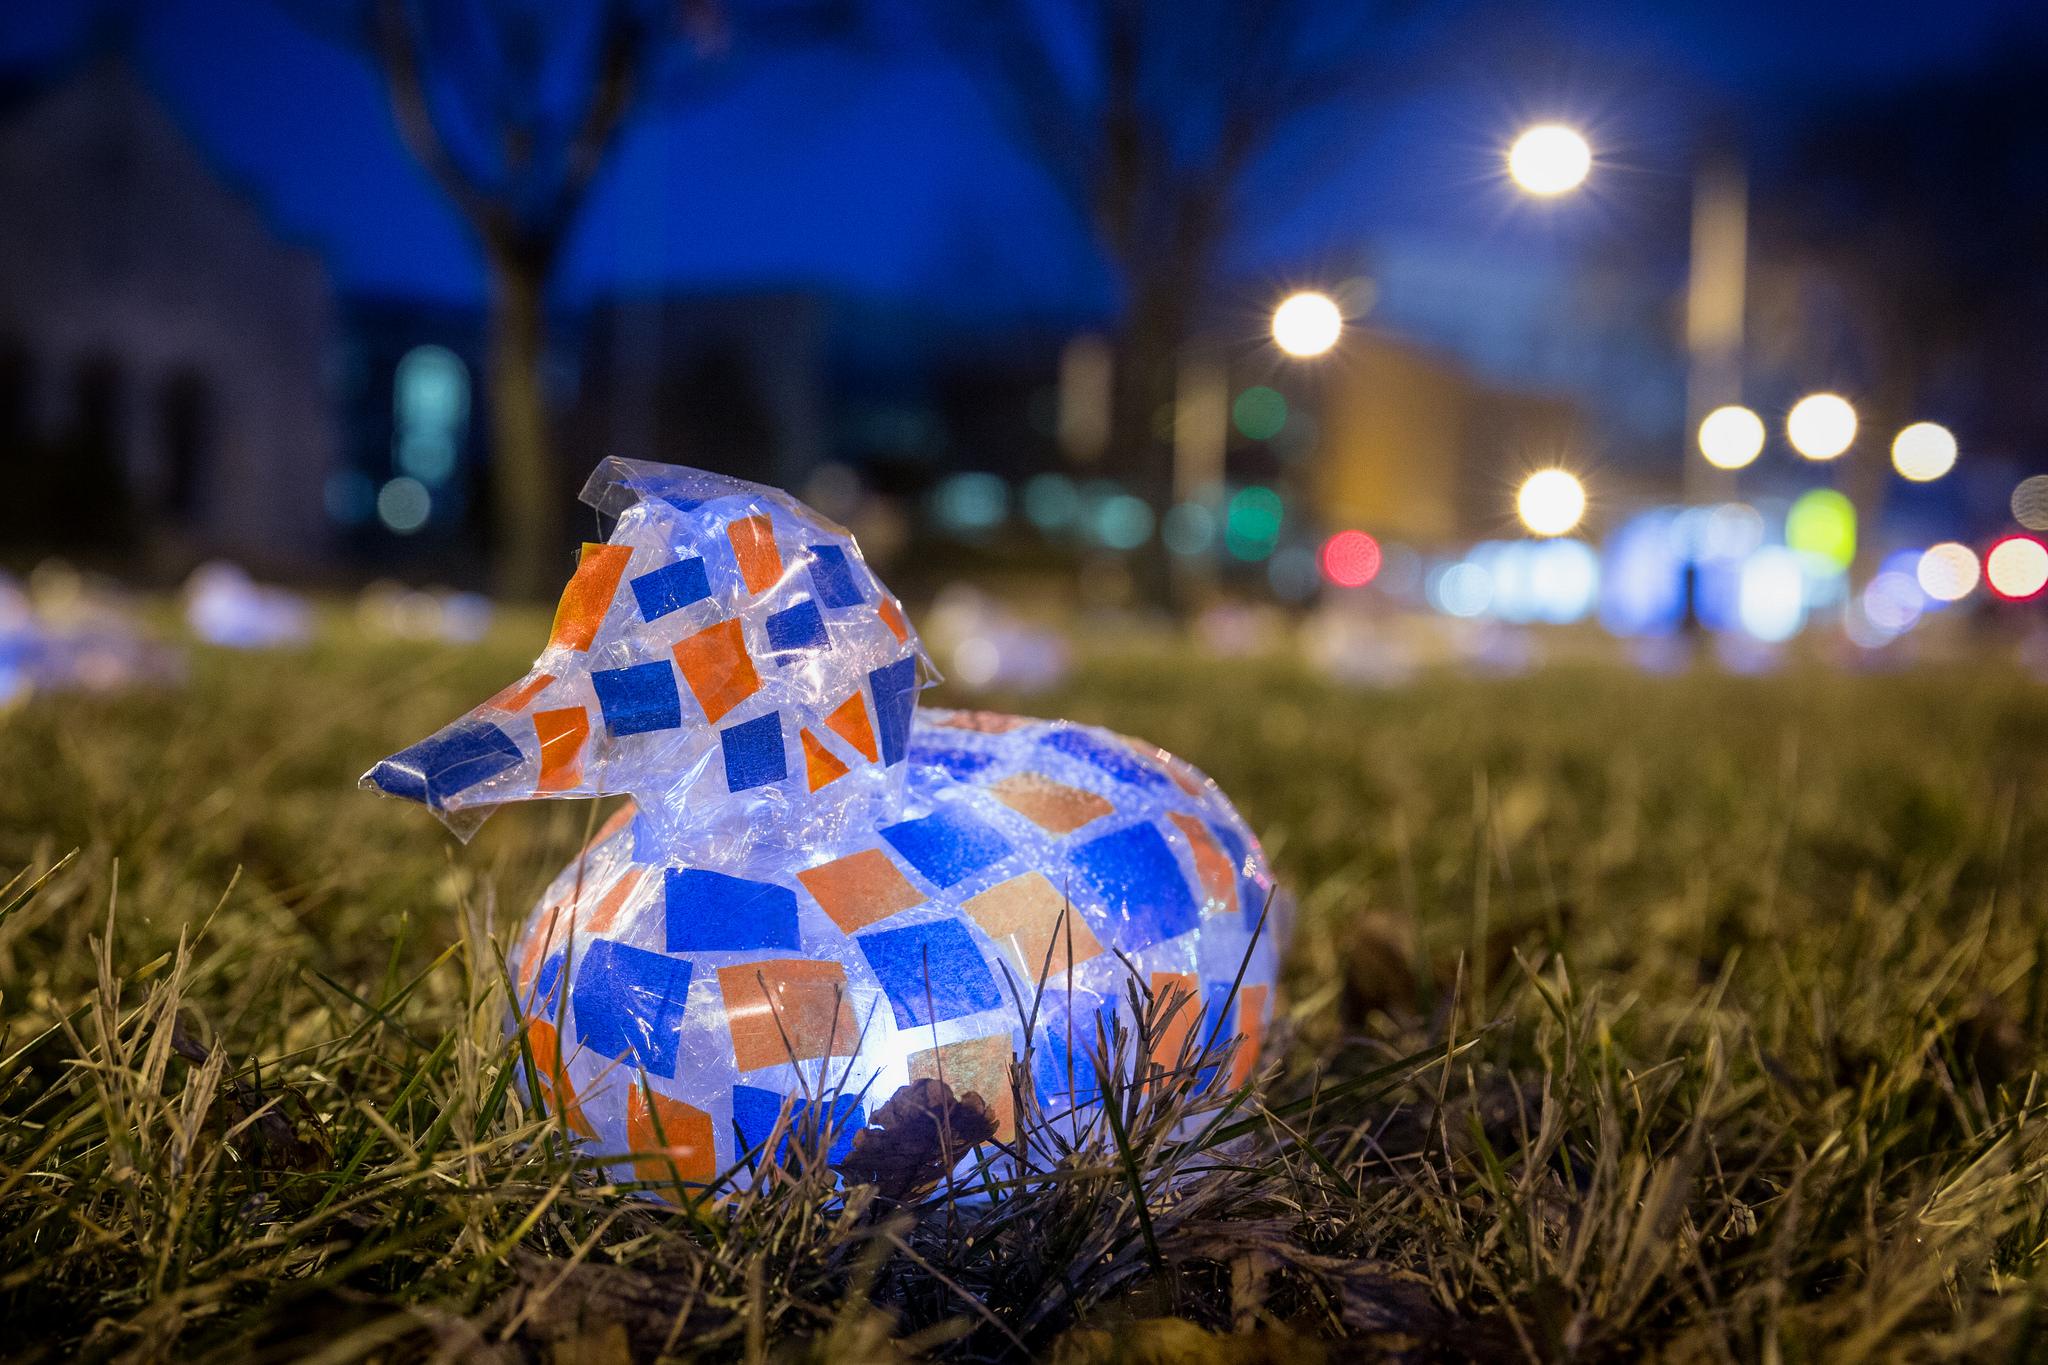 Blue and Orange Duck, #100DucksDC